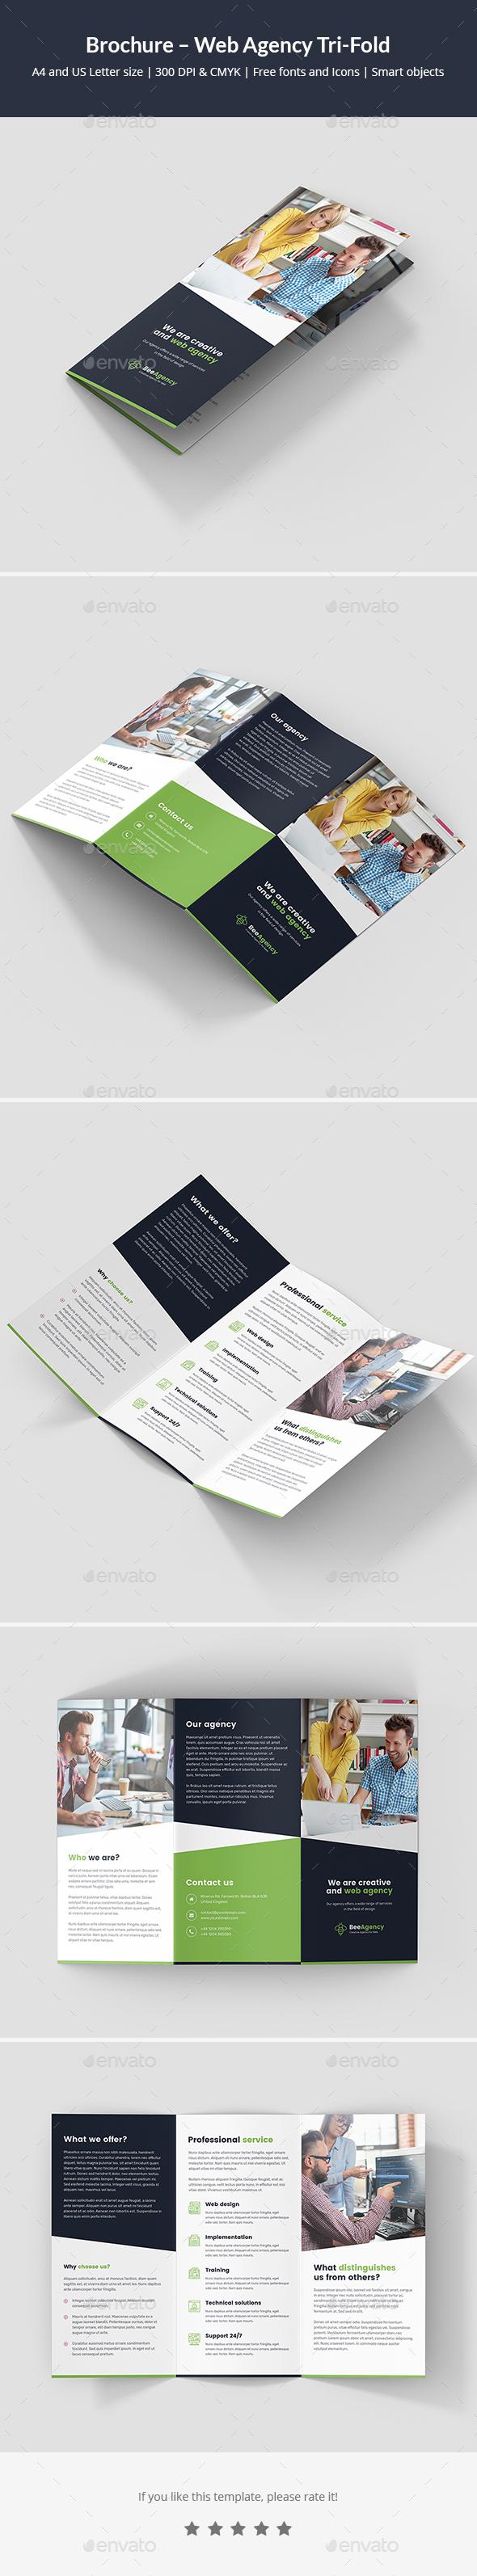 Brochure – Web Agency Tri-Fold - Corporate Brochures